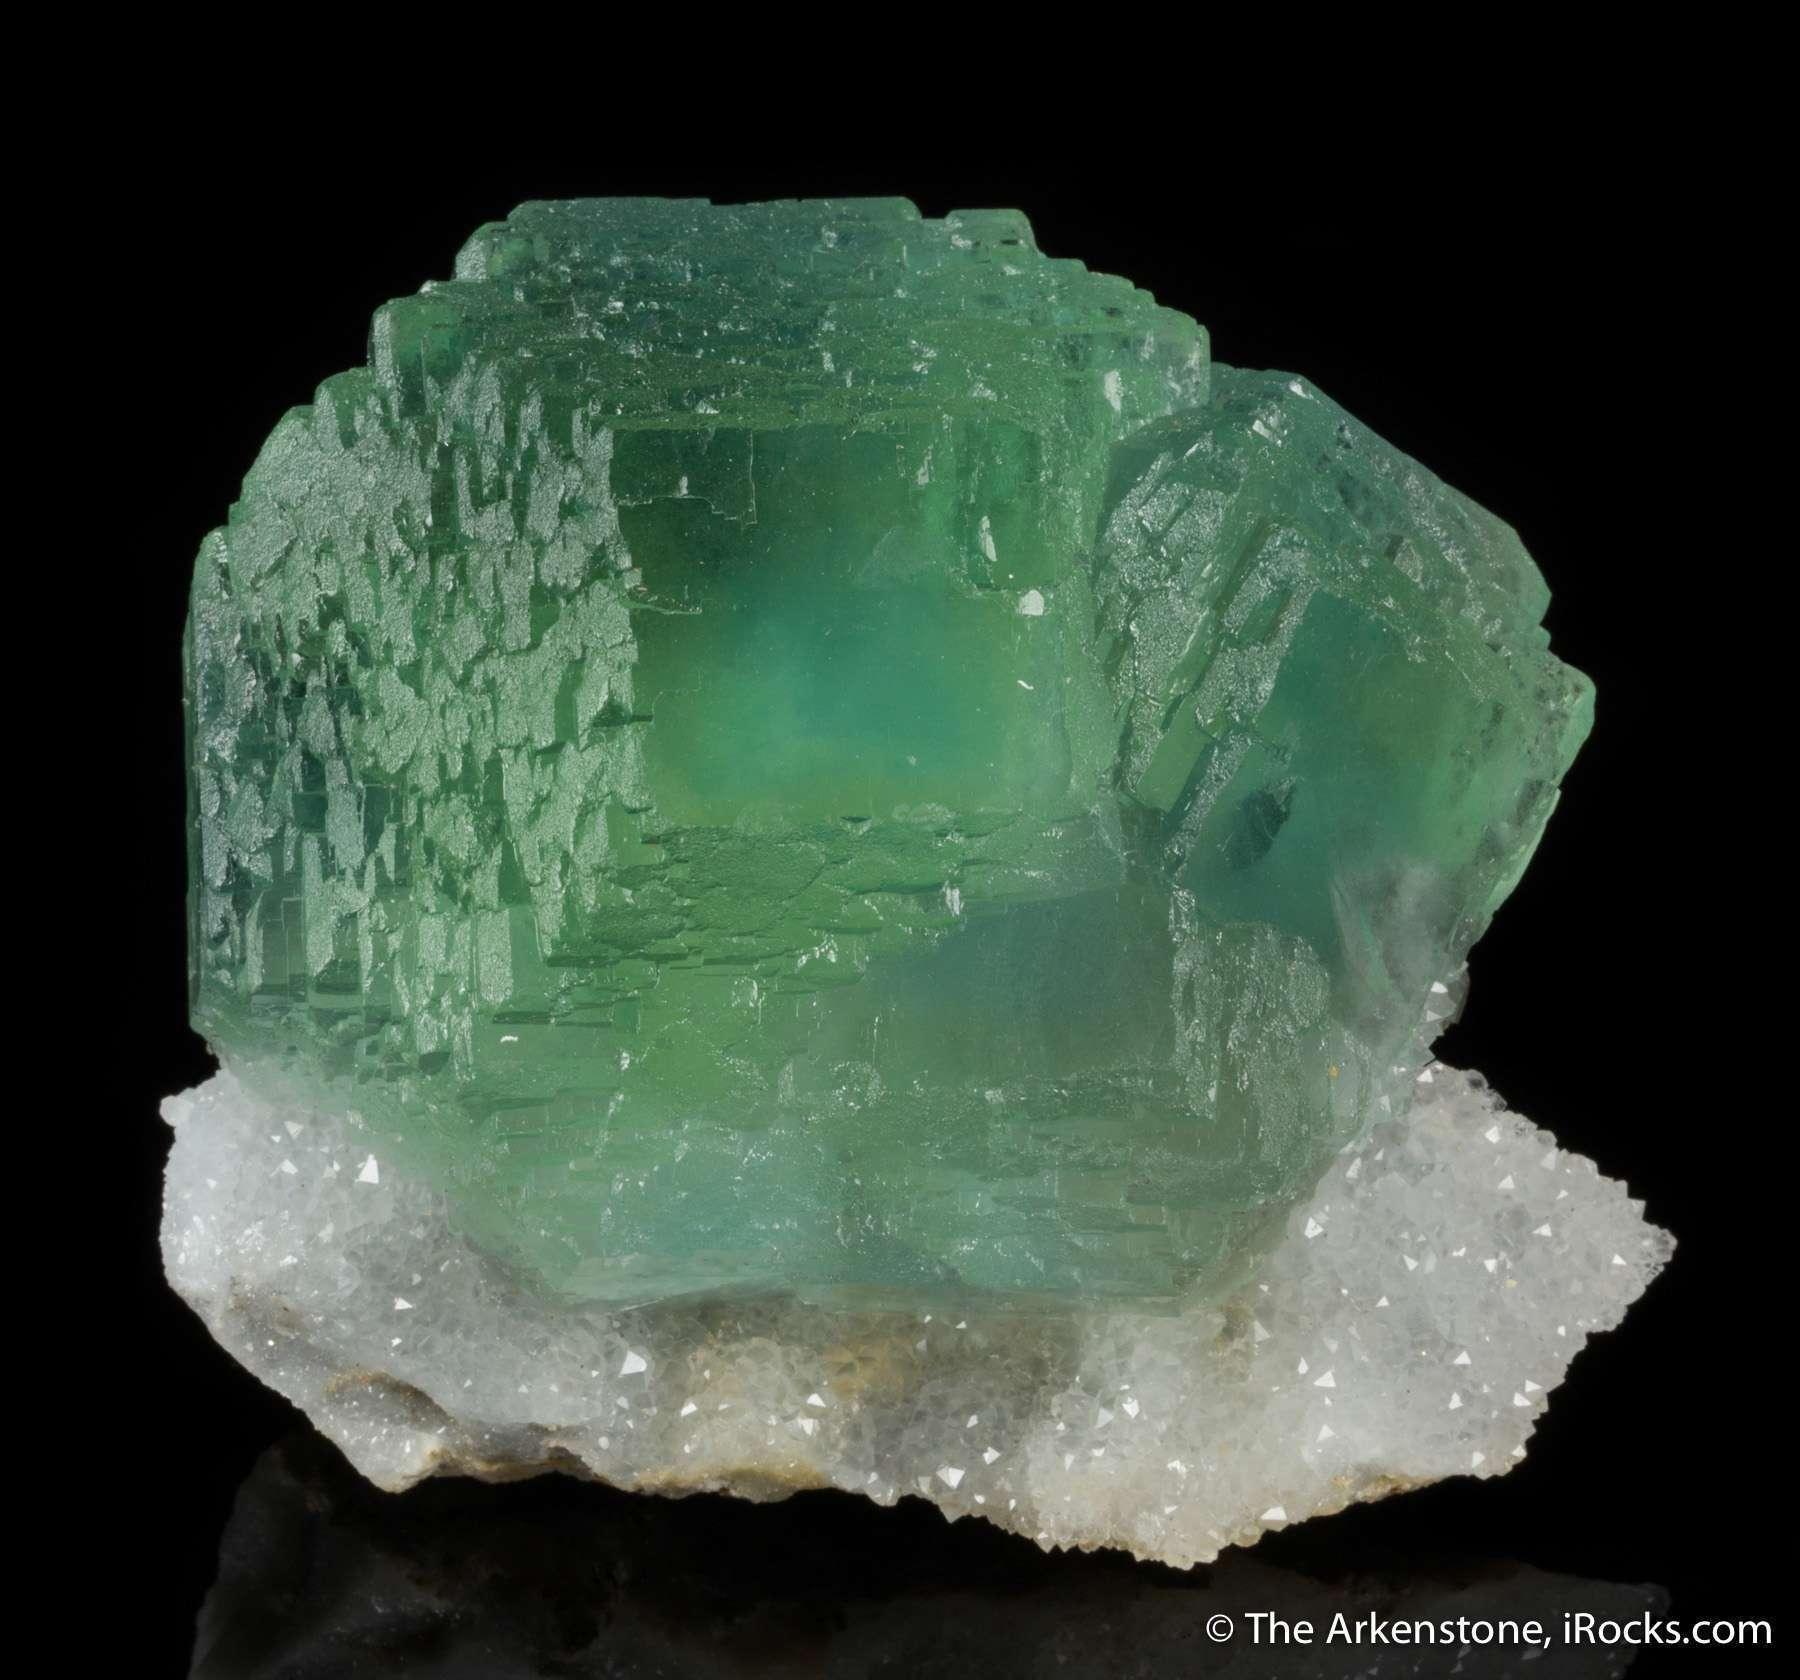 A pedestal drusy sparkling quartz forms matrix intergrown cluster